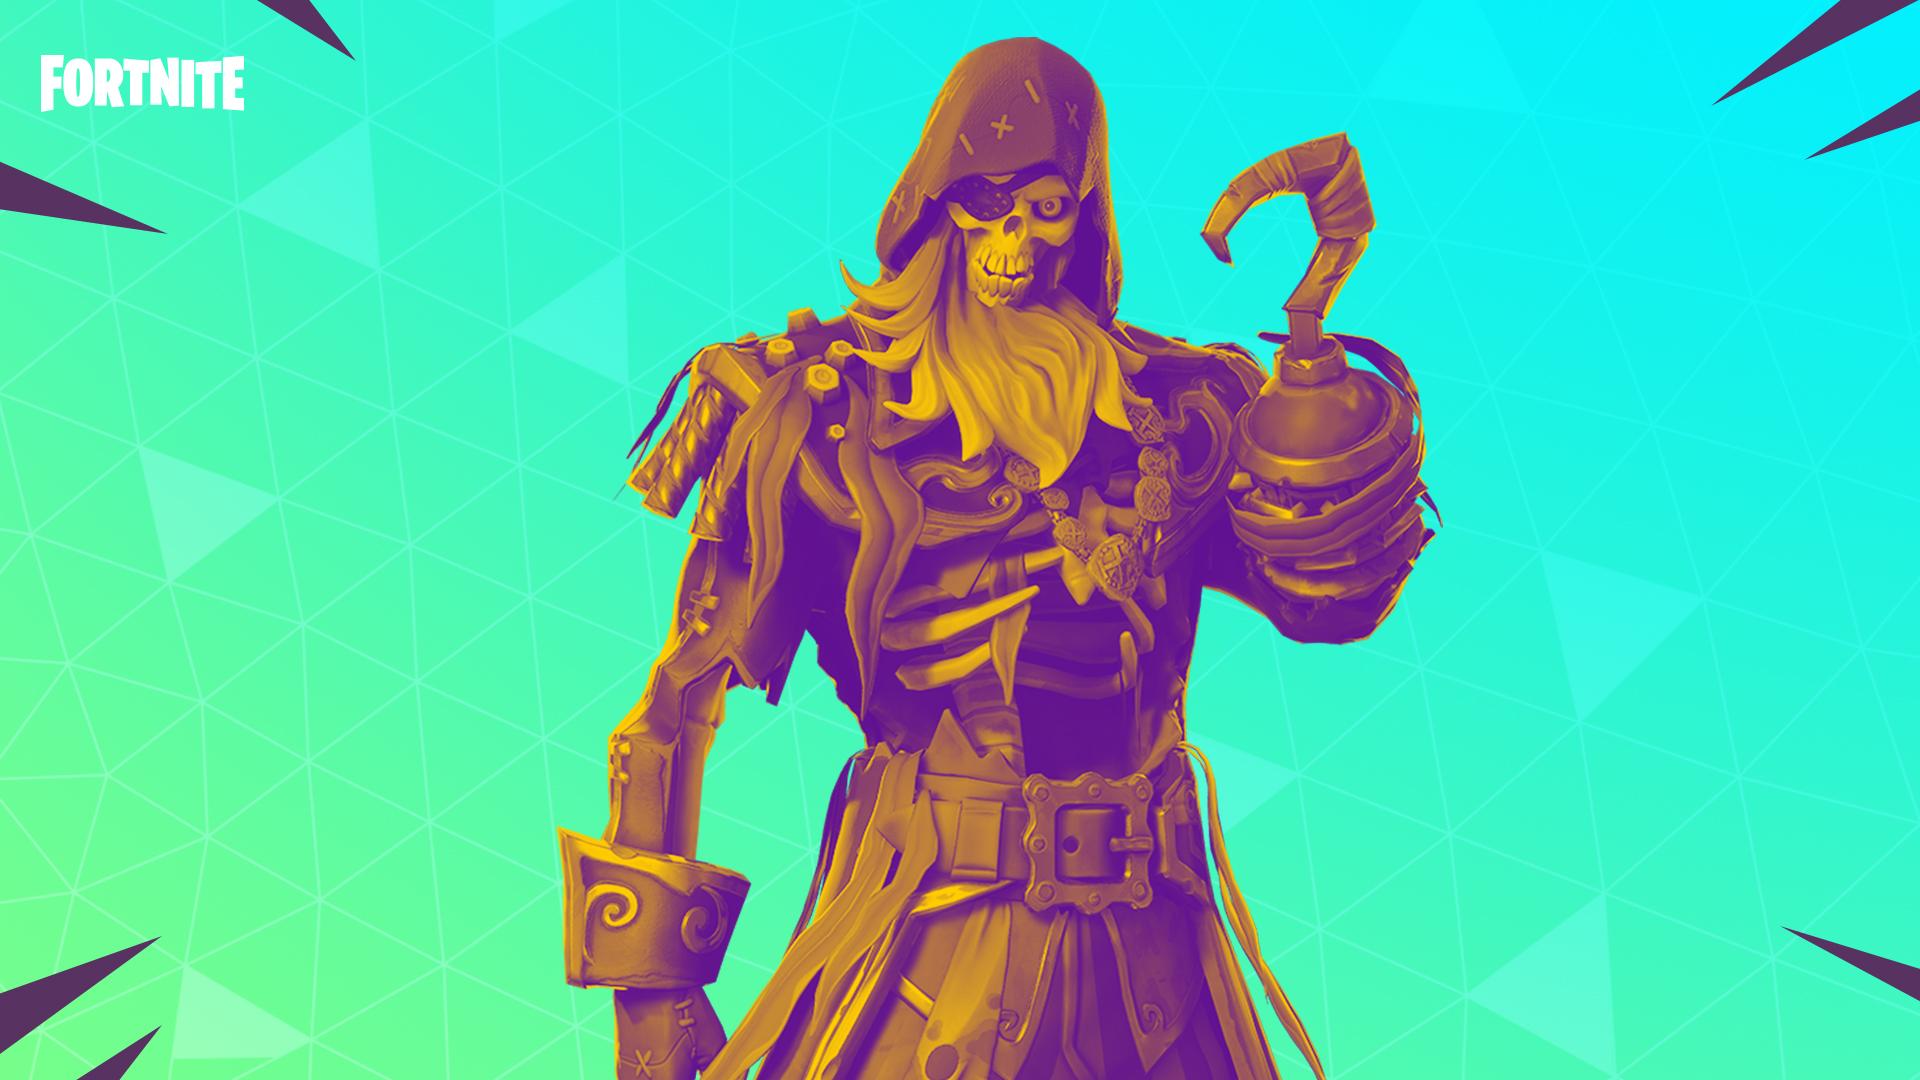 Fortnite Player Count 2019 Live | Fortnite Code Generator Pc